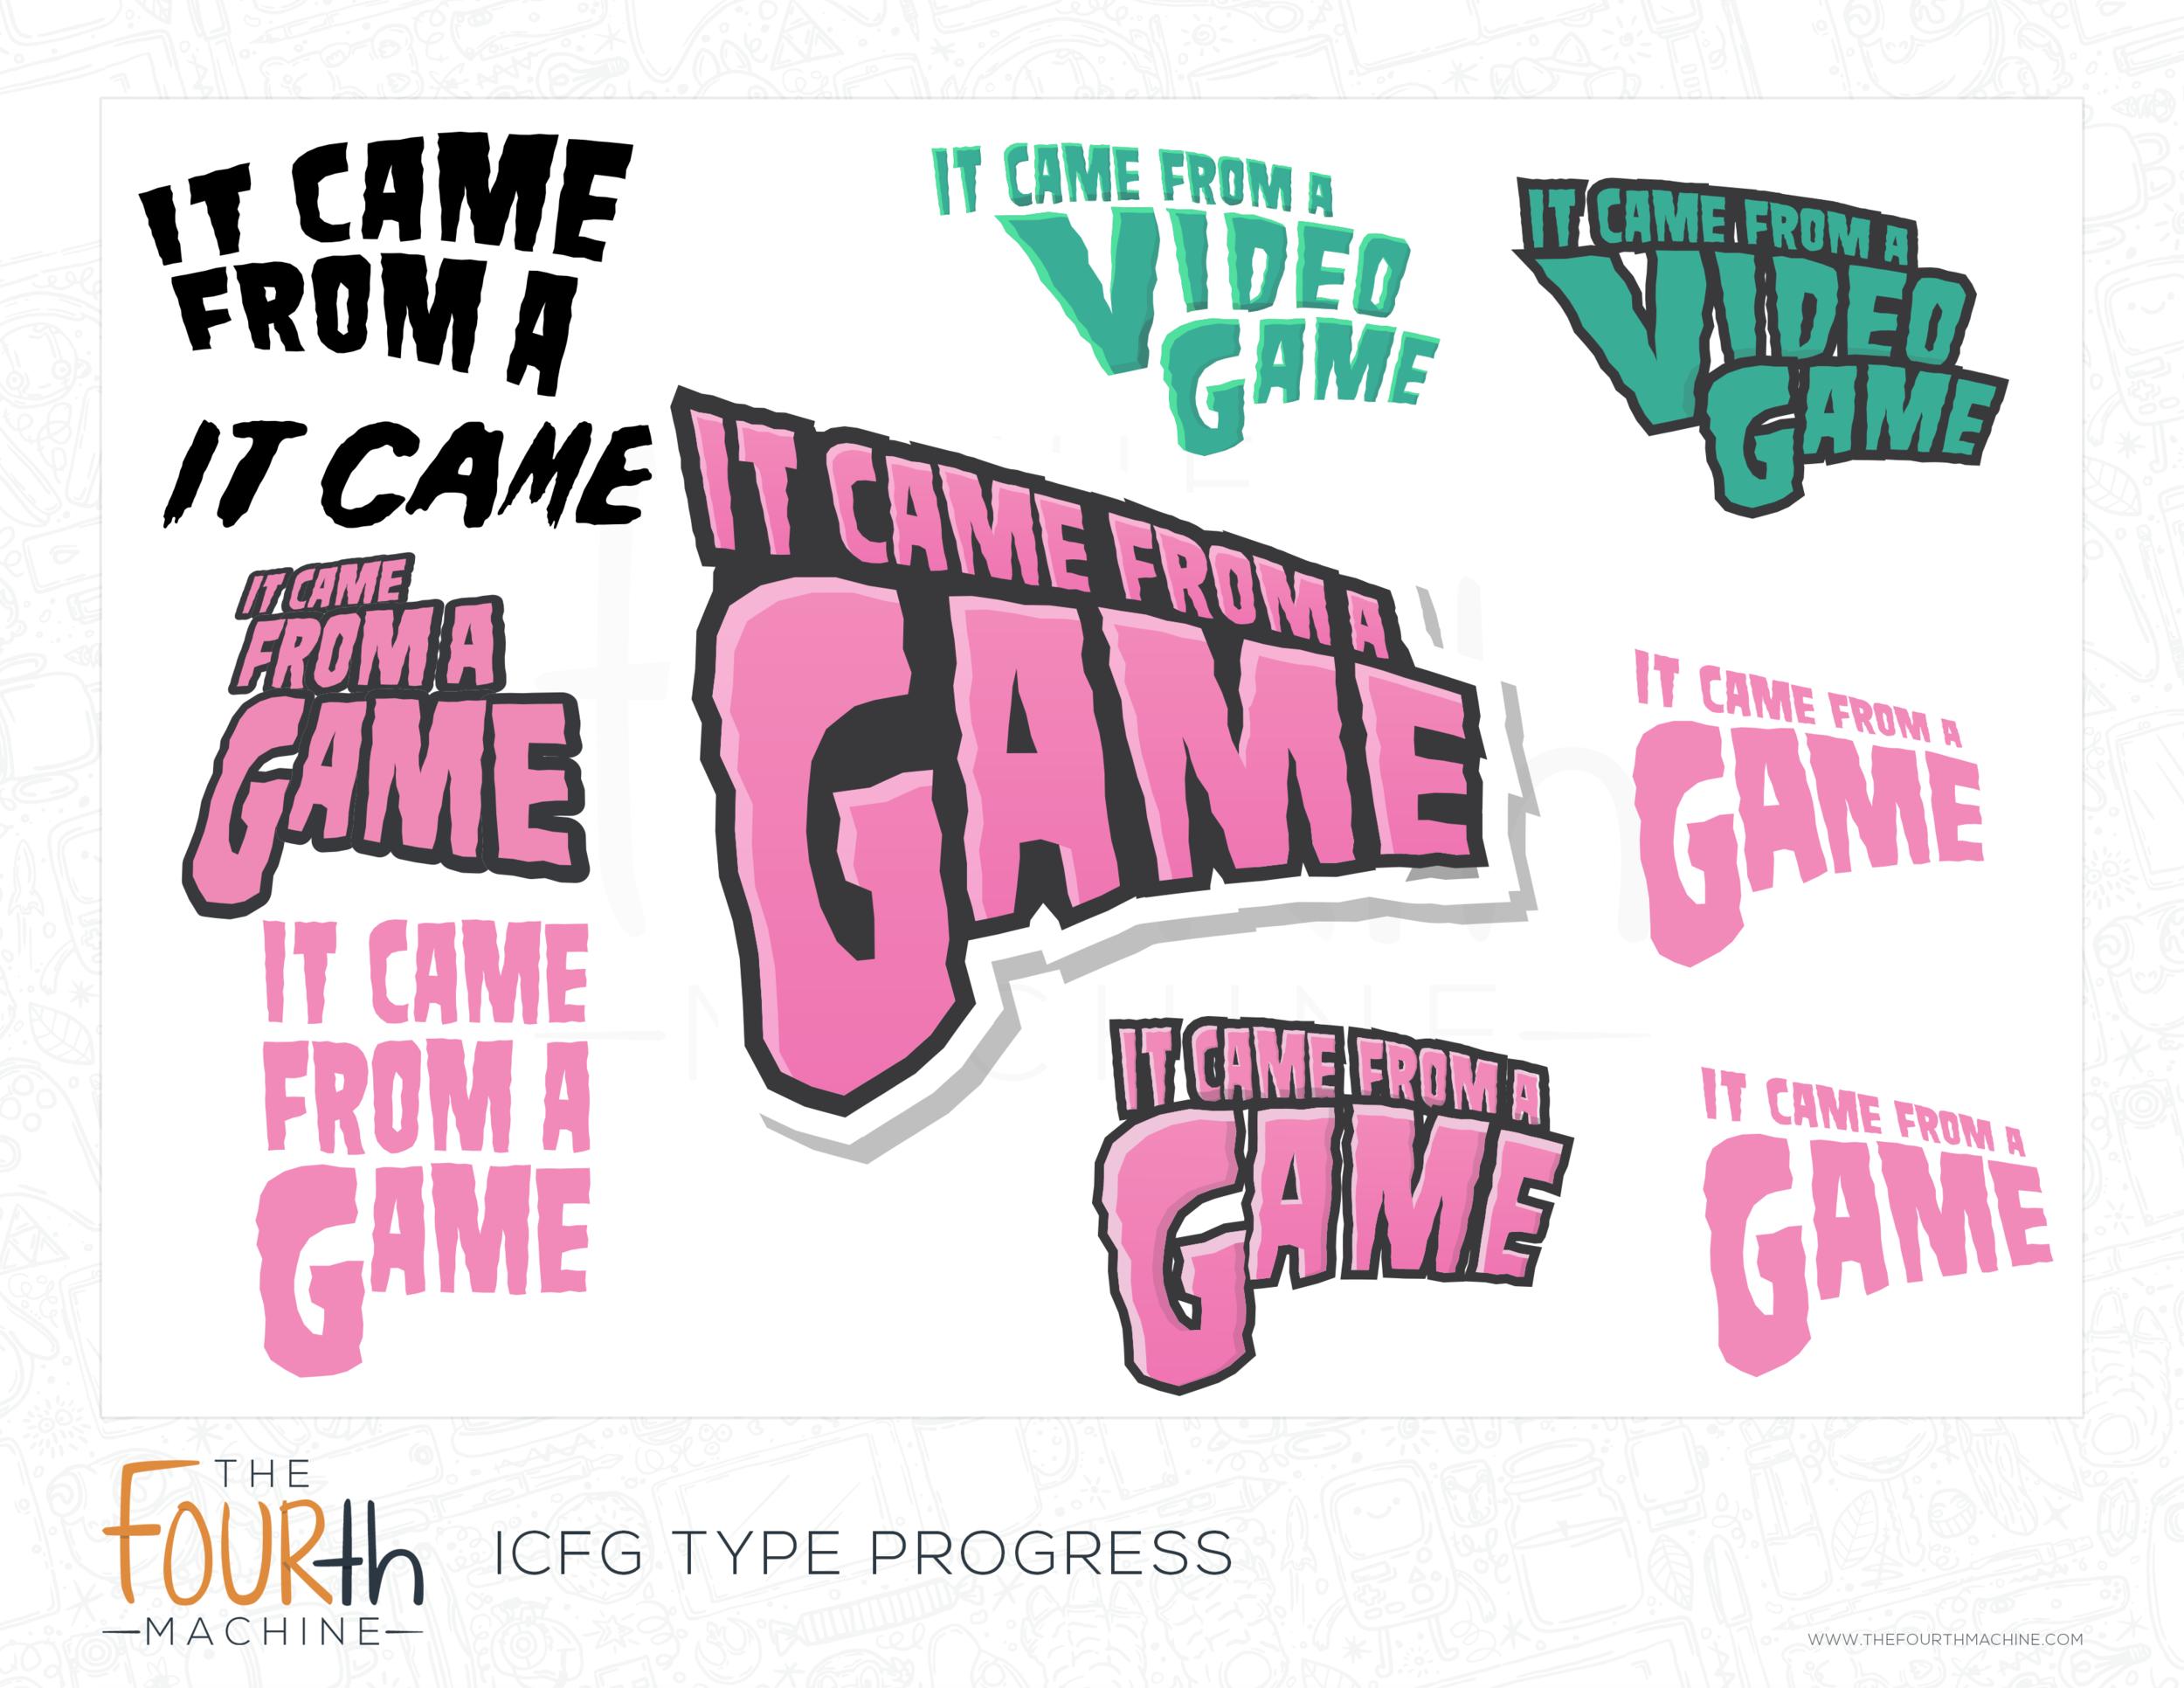 ICFG_Type_Progress.png